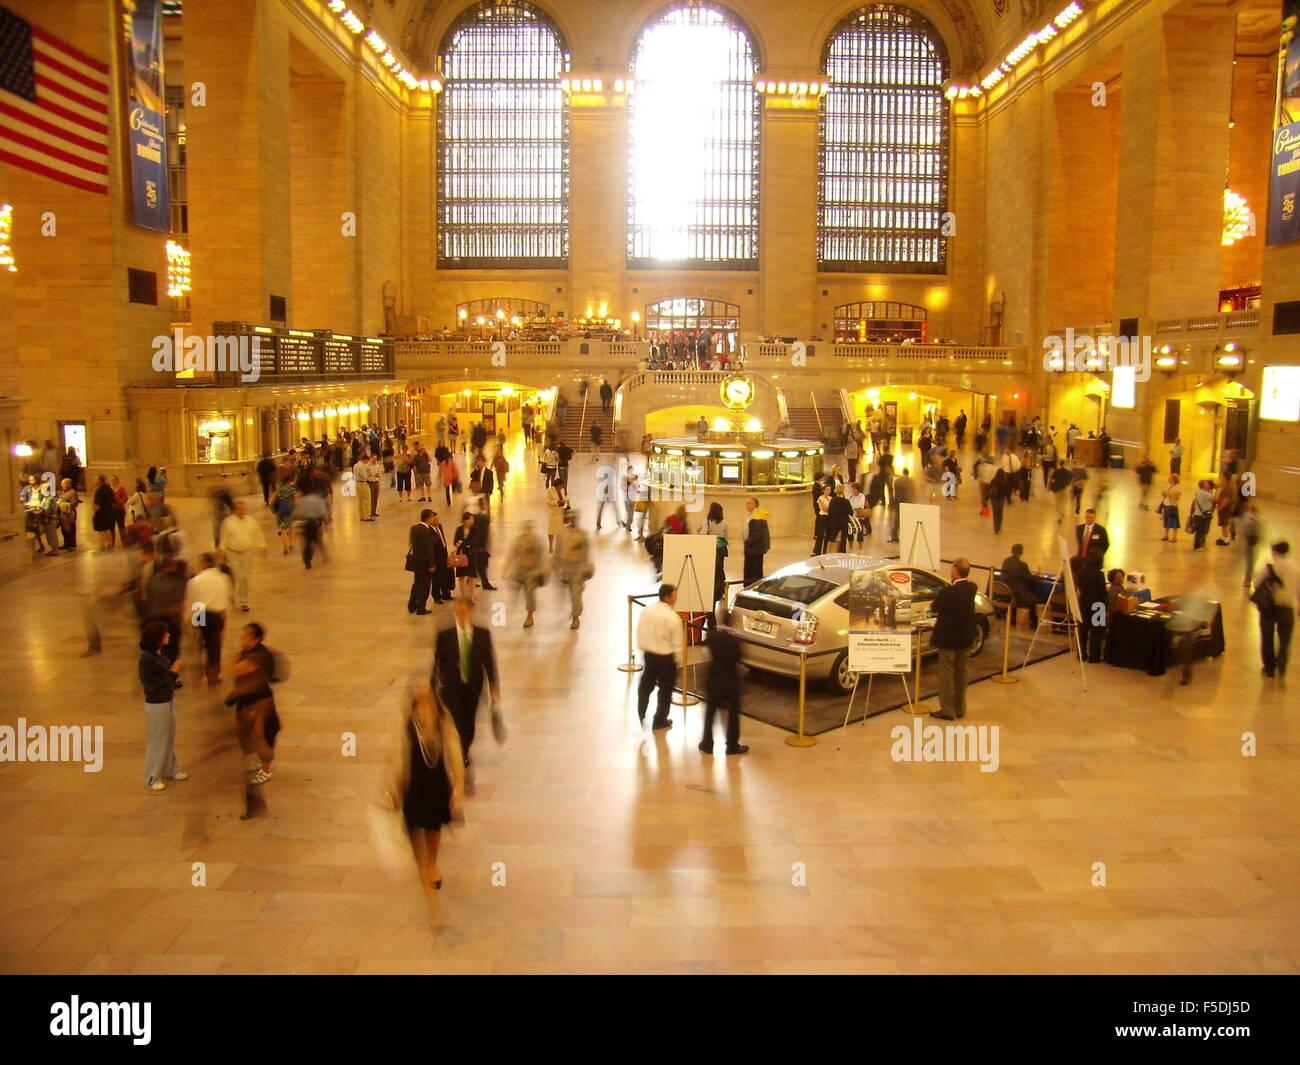 Grand Central Station, New York City, Etats-Unis, USA. Photo Stock